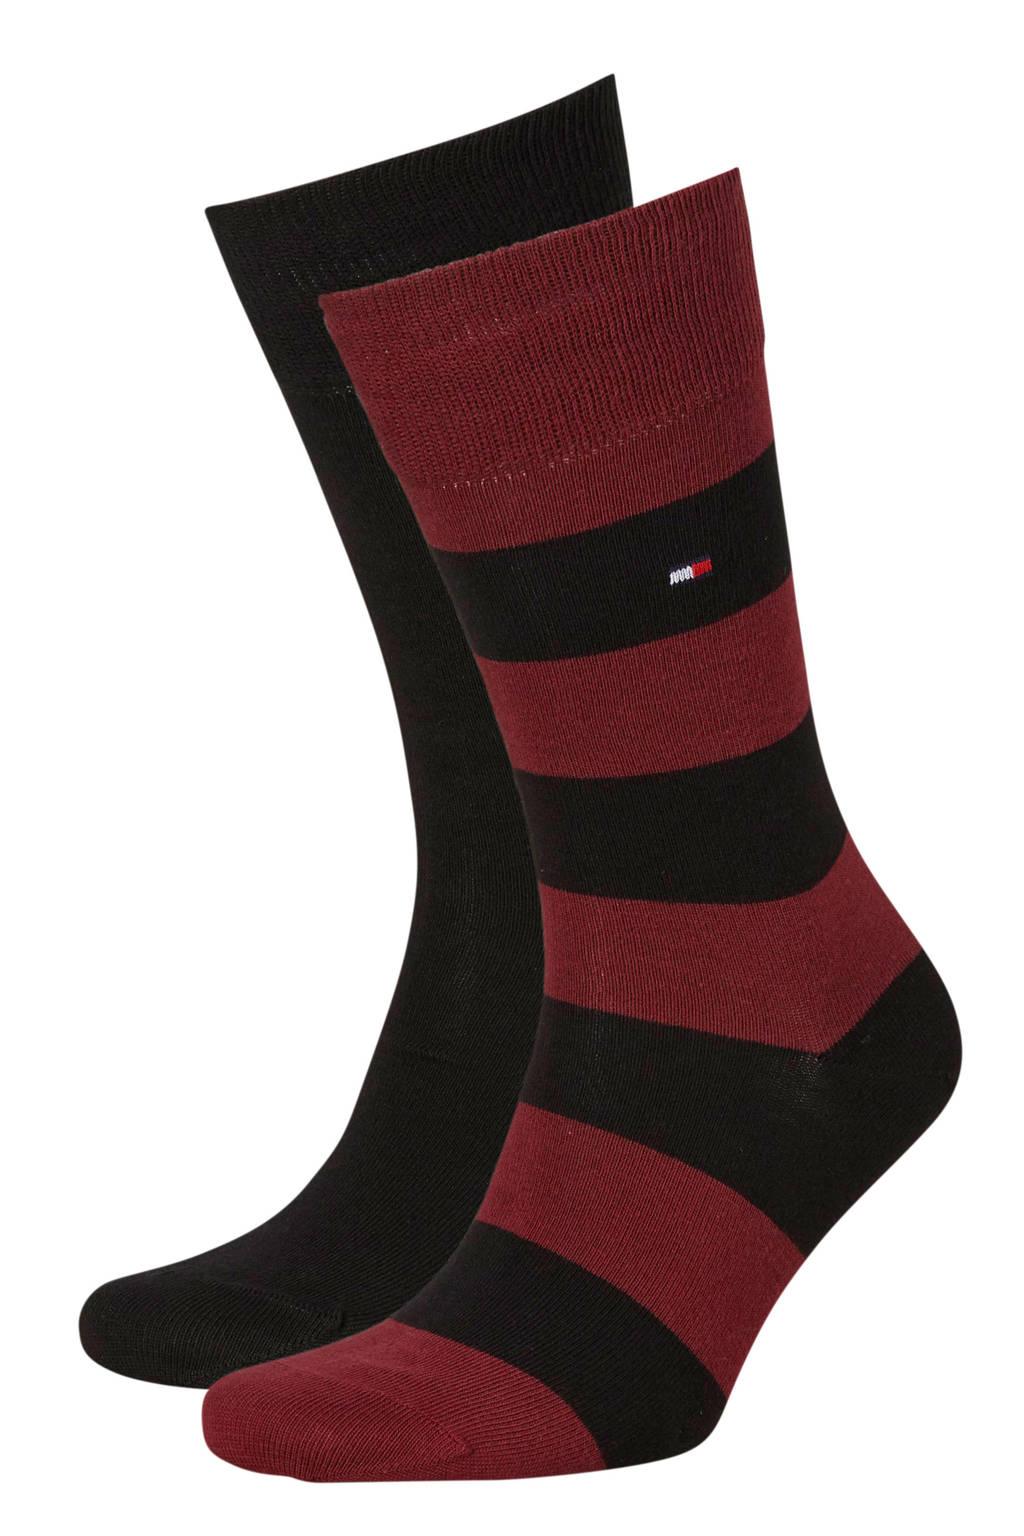 Tommy Hilfiger sokken Rugby ( 2 paar ) bordeaux, Bordeaux